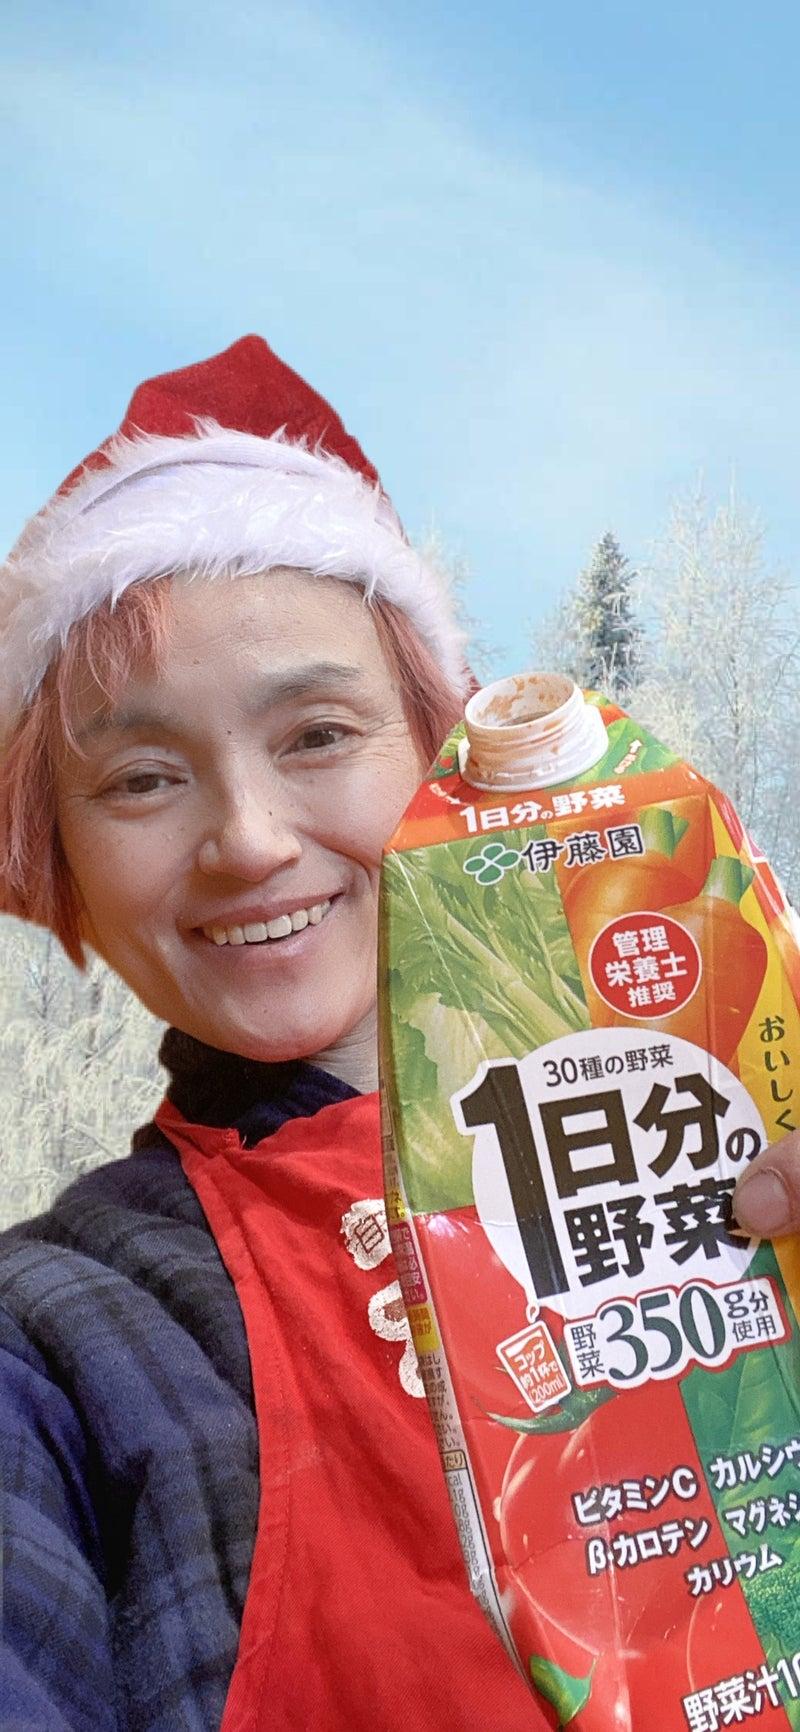 野菜 の 分 伊藤園 日 一